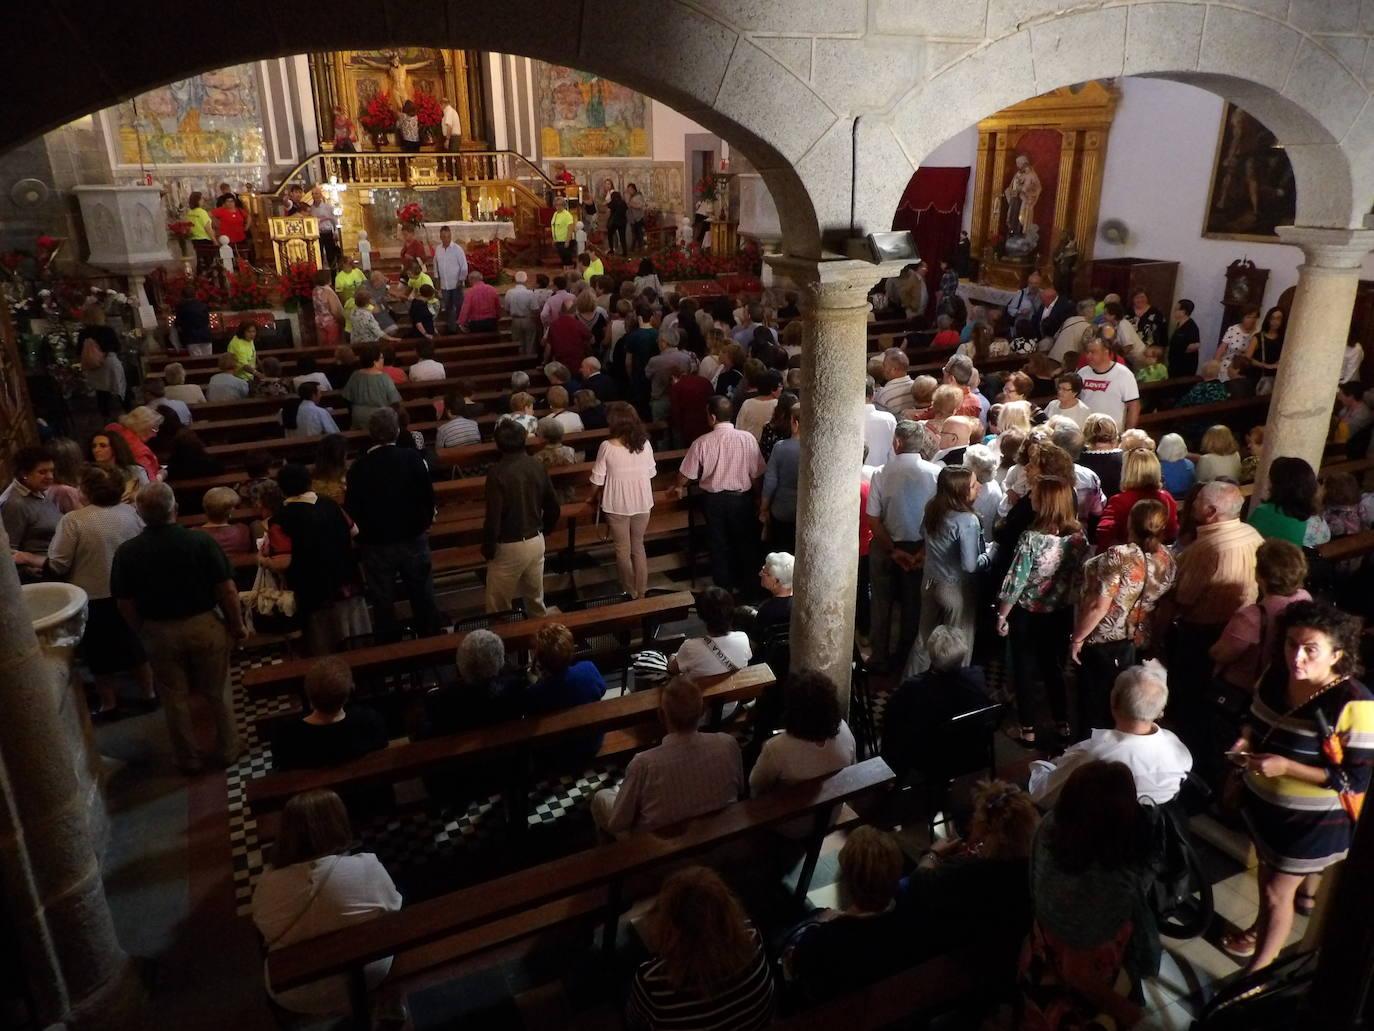 El Cristo de la Quinta Angustia volvió a recibir a miles de peregrinos